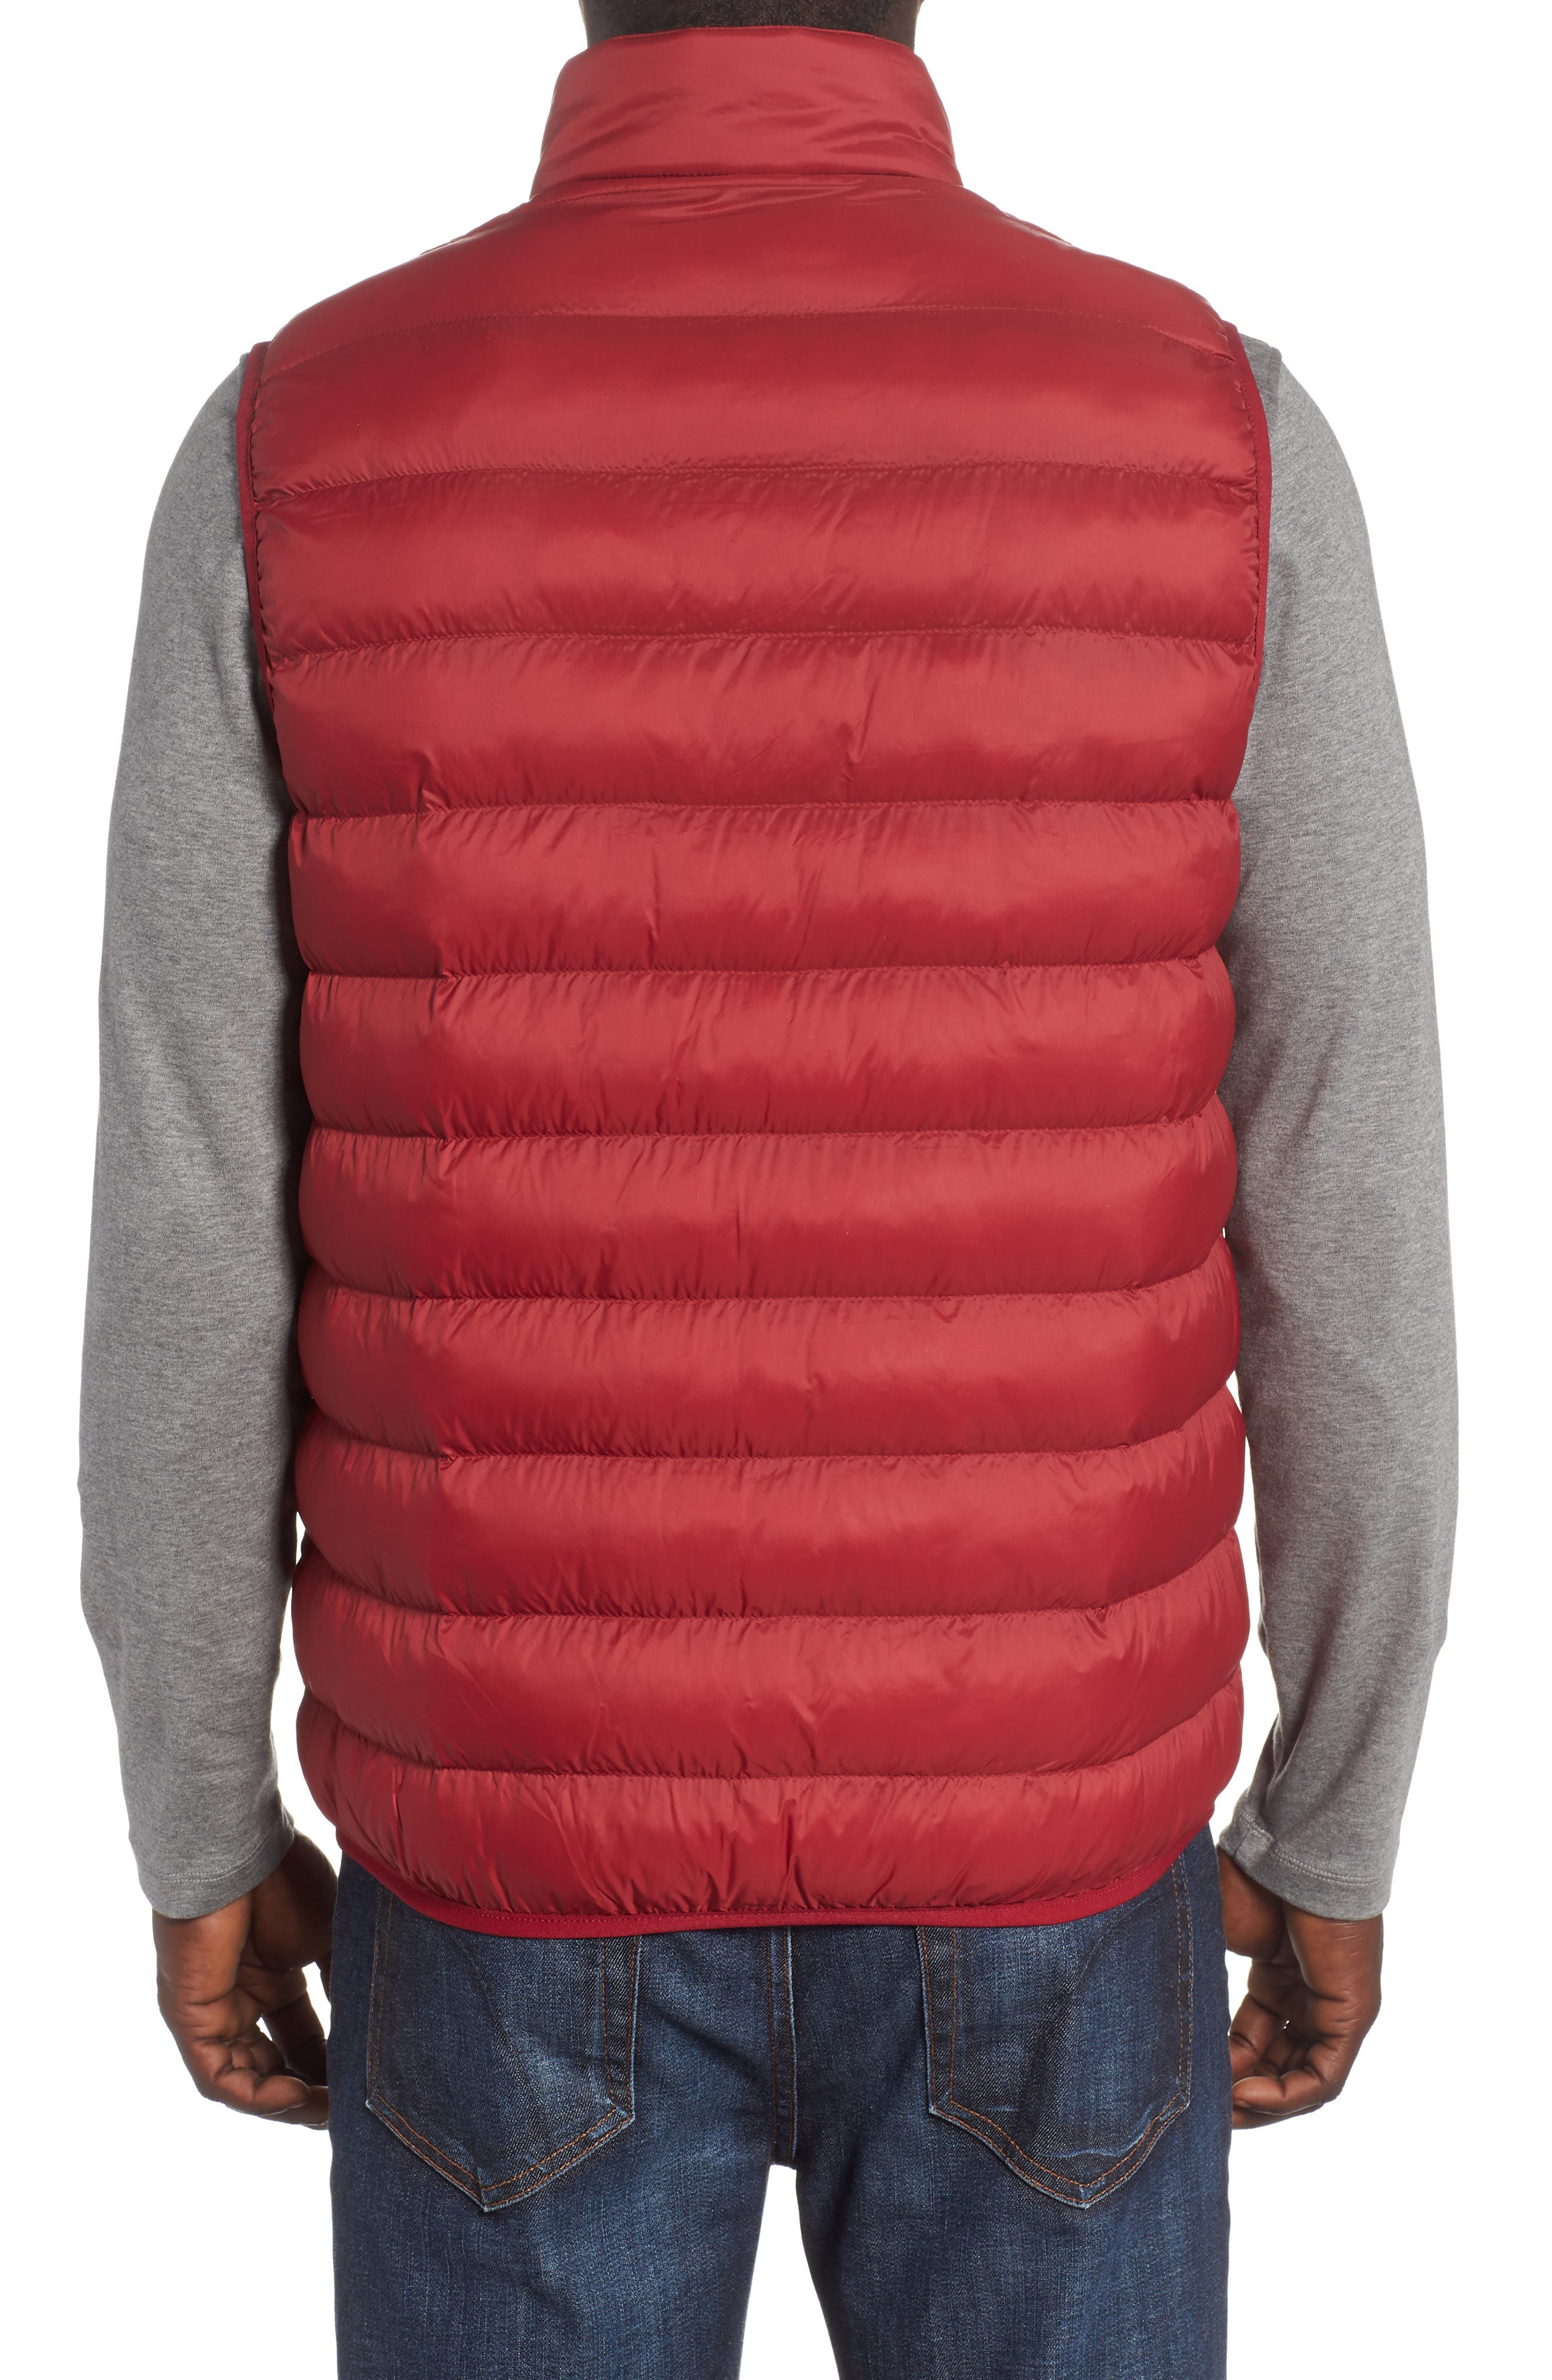 Askham Quilted Vest,                             Alternate thumbnail 2, color,                             Biking Red